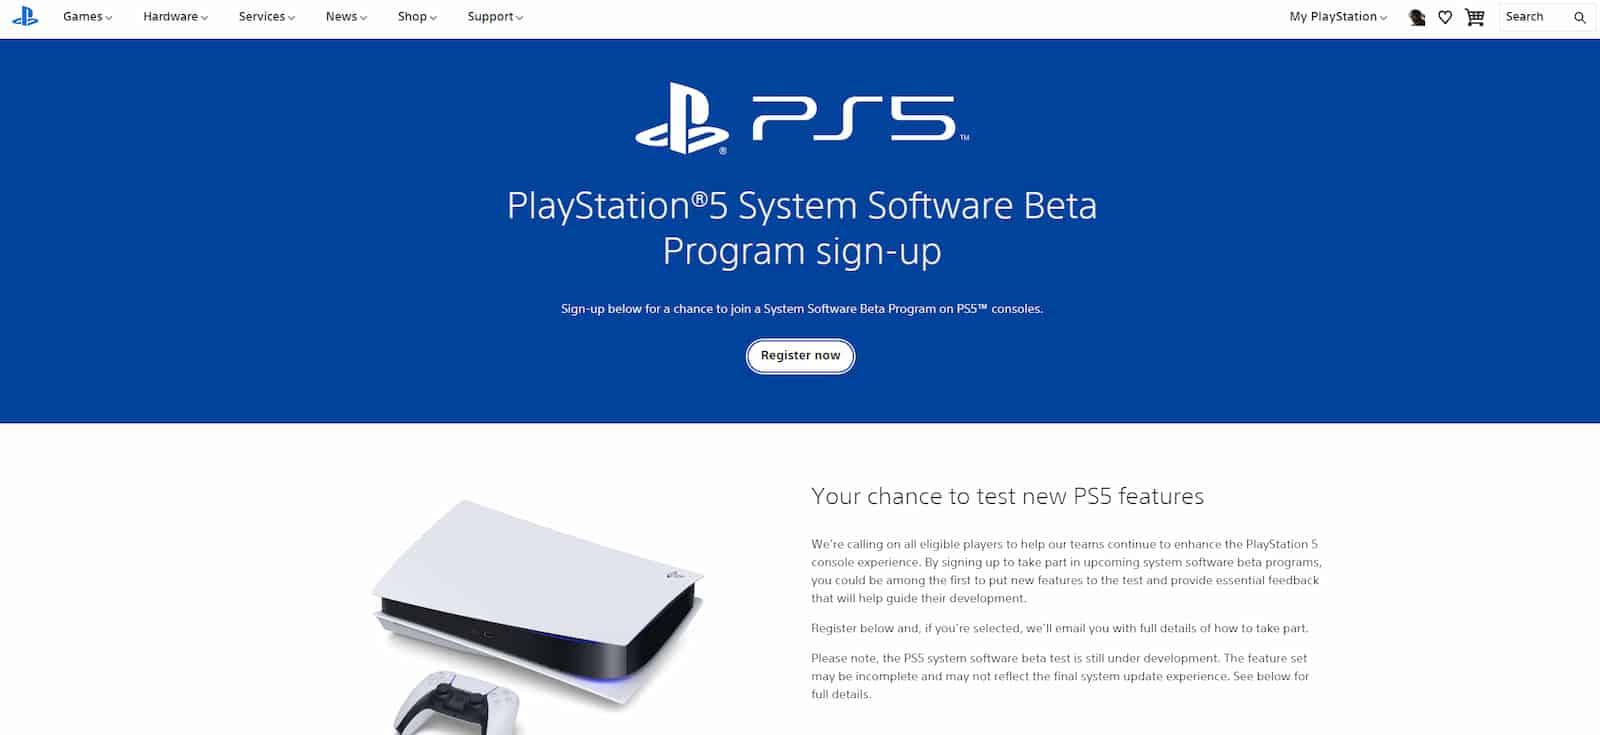 Sony PS5 System Software Beta Program 1